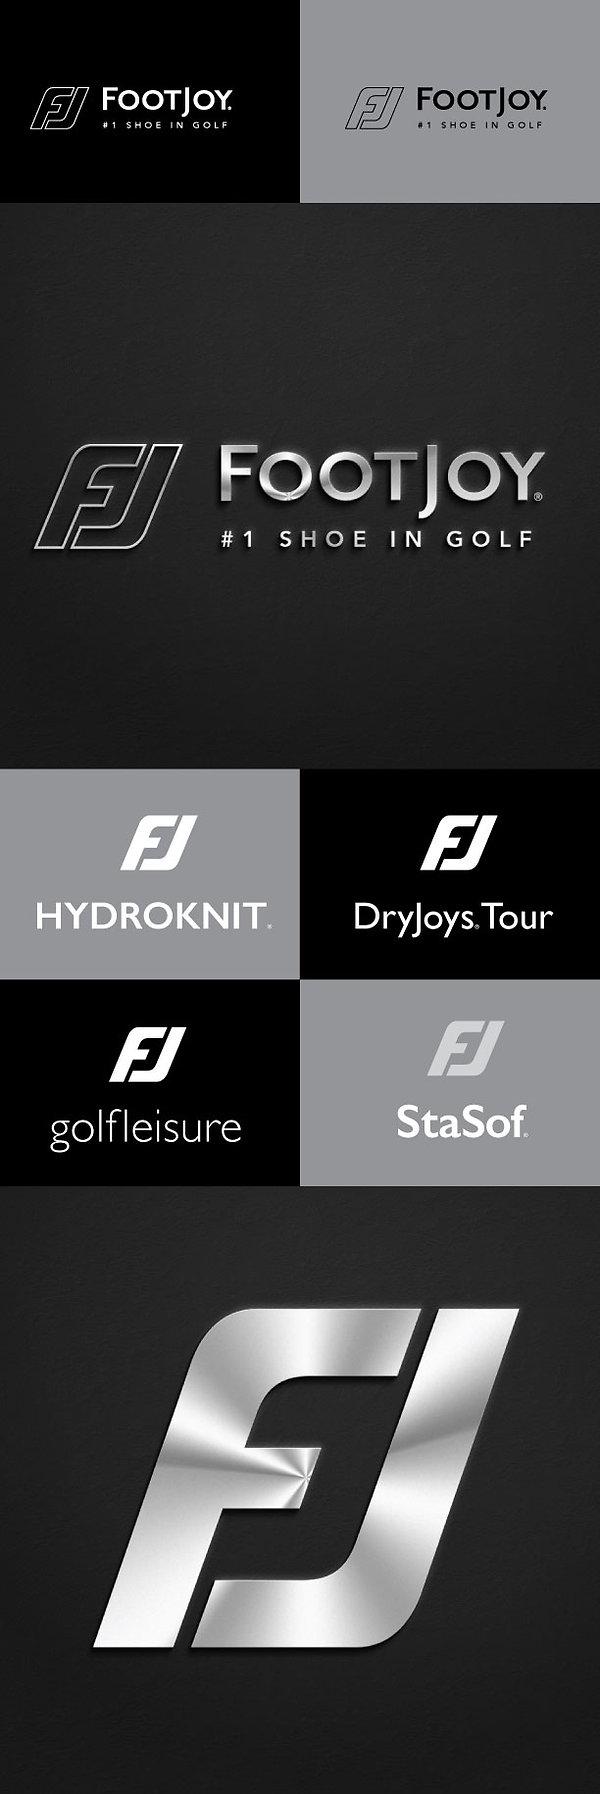 FJ-new-logo-subbrands.jpg